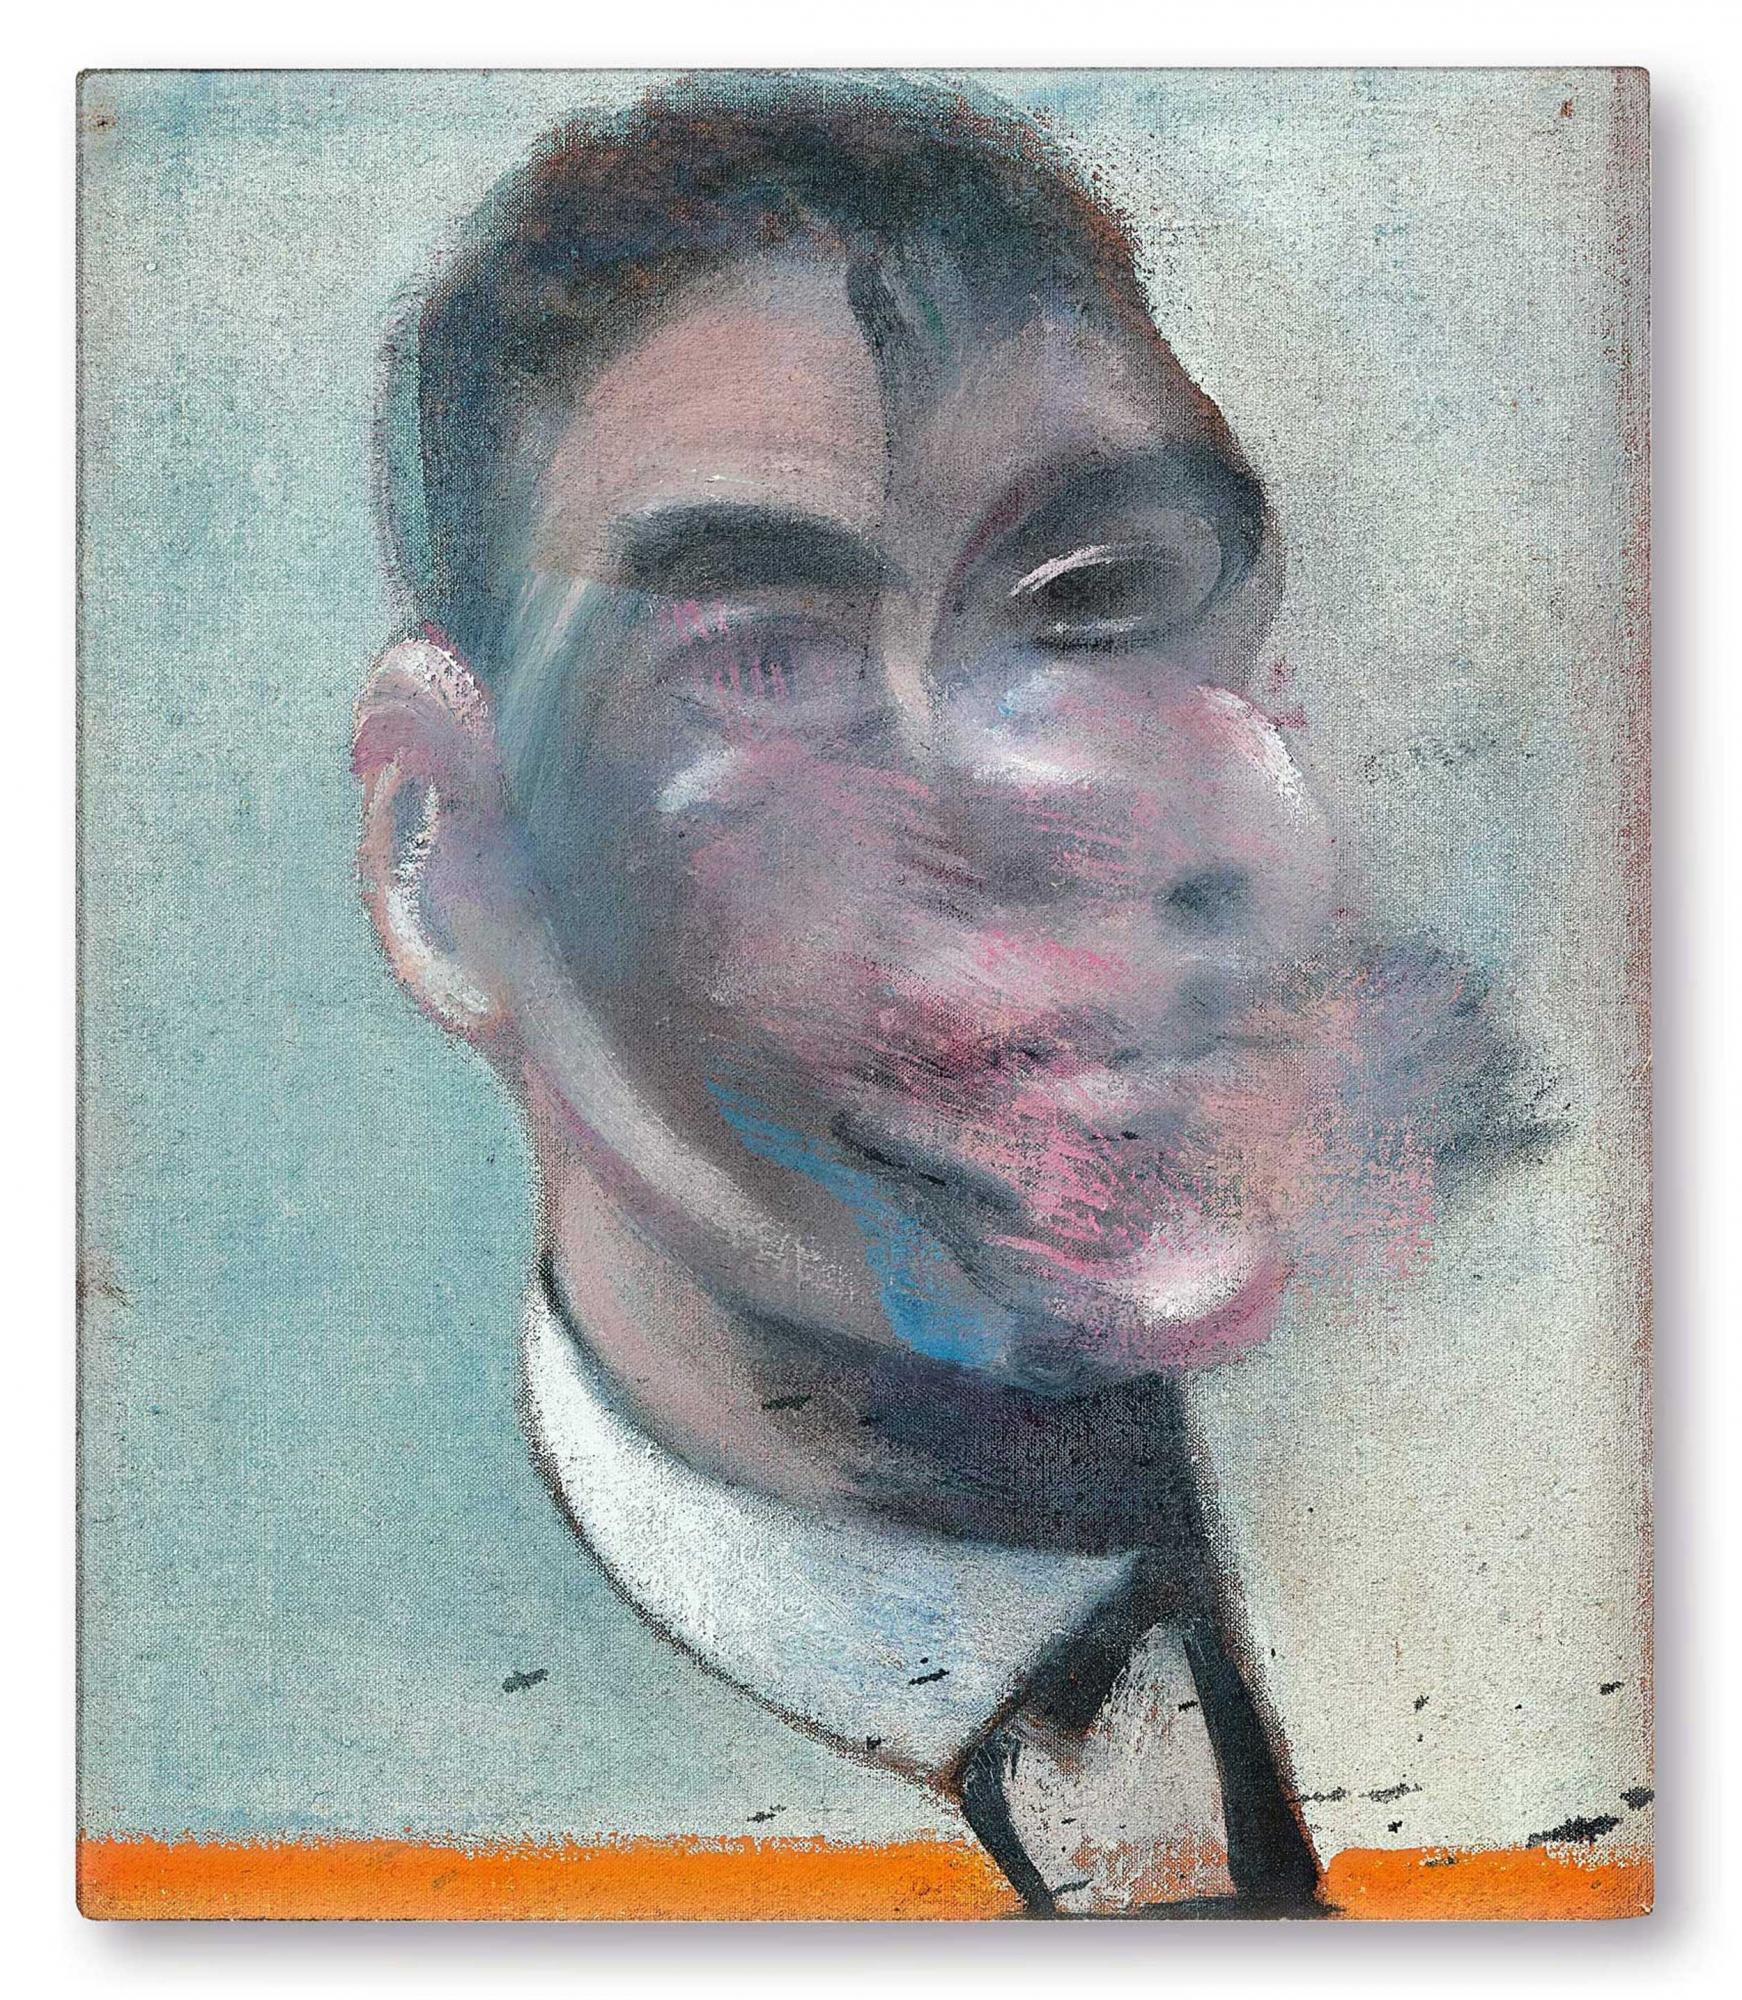 Francis-Bacon-Study-for-a-Portrait.jpg